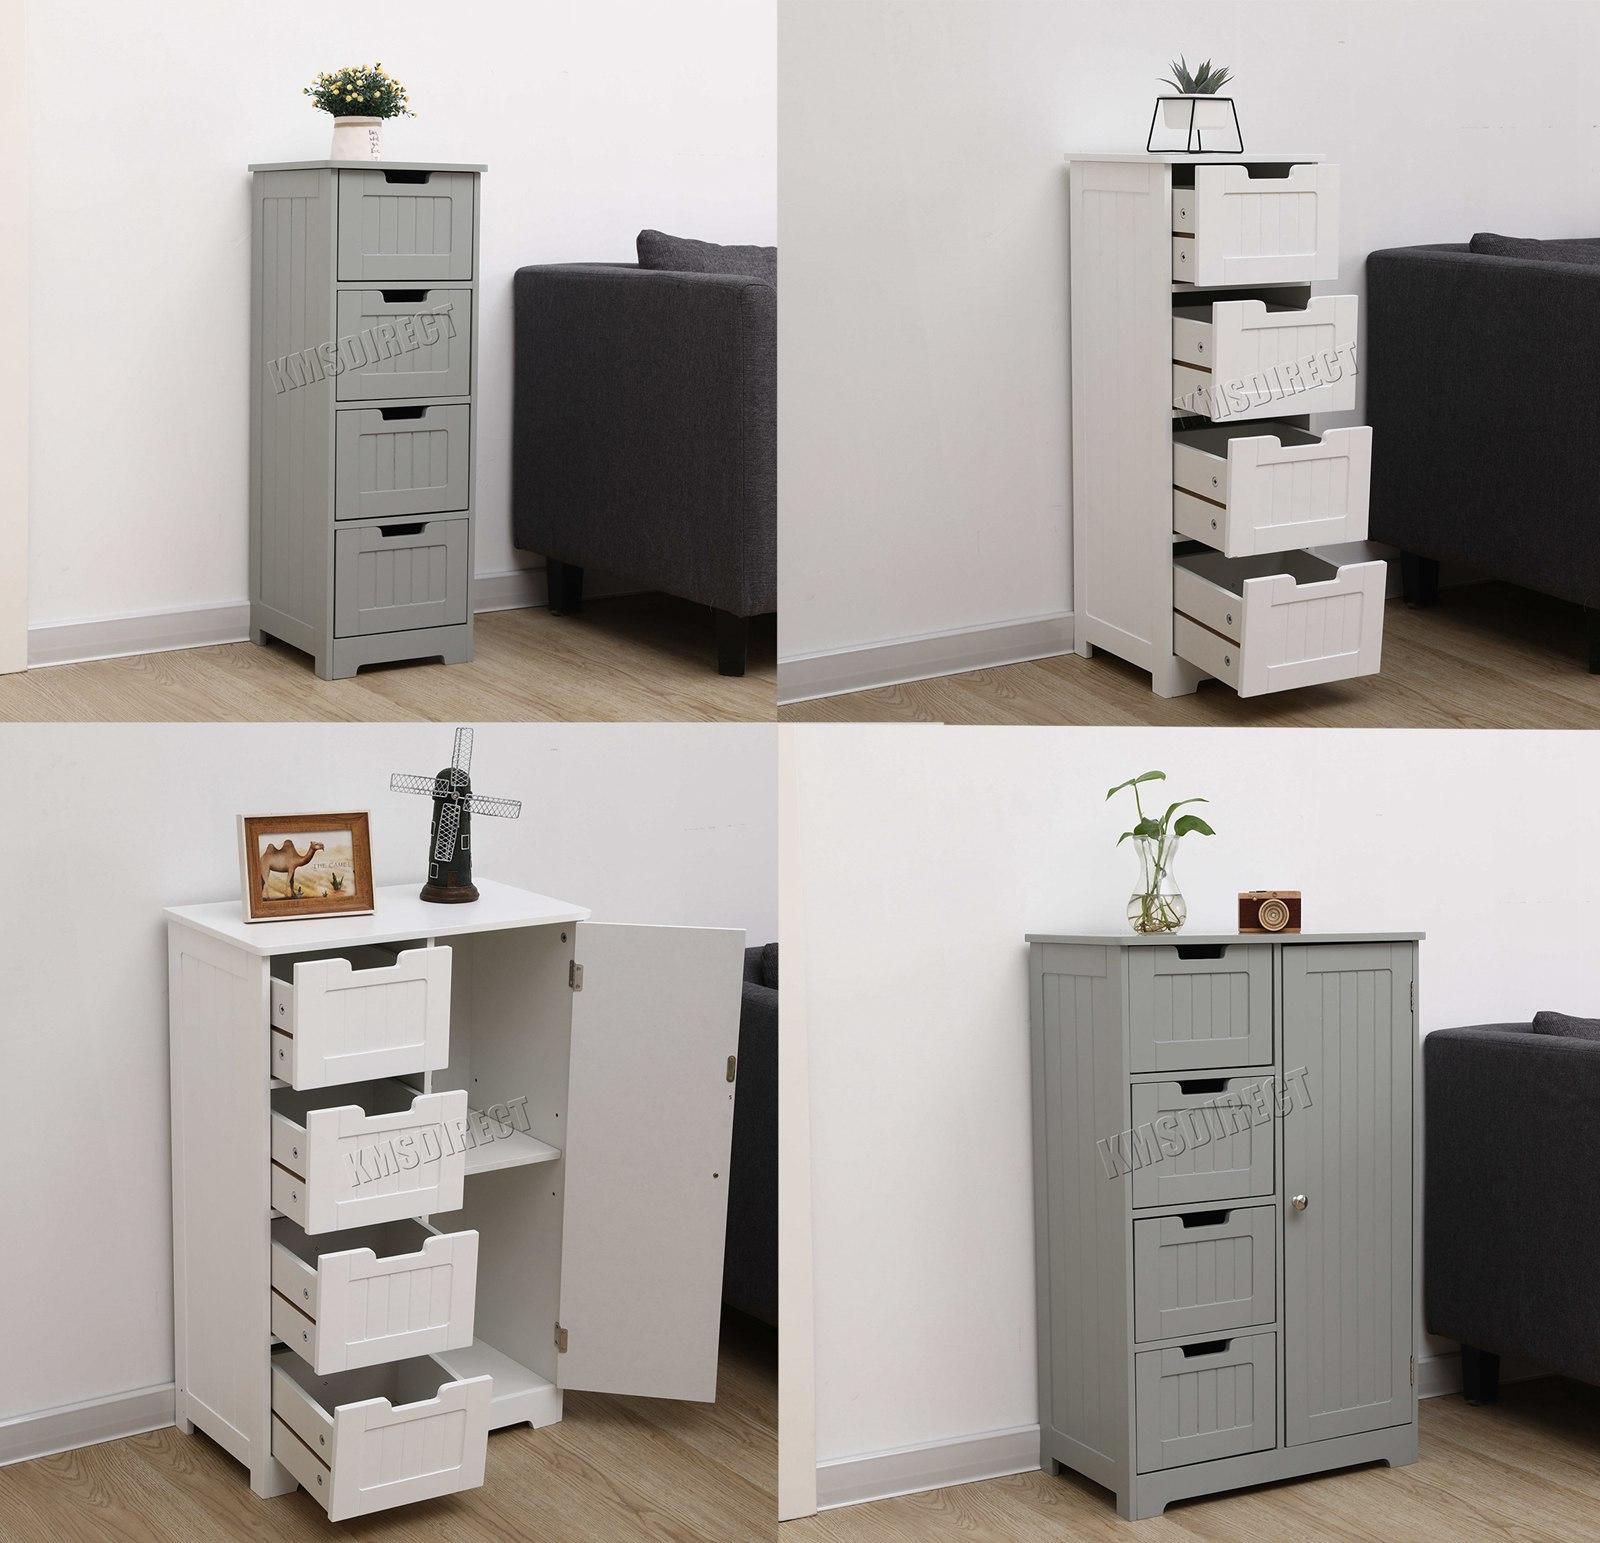 Westwood Bathroom Storage Cabinet Wooden 4 Drawer Cupboard Free Standing Unit Ebay